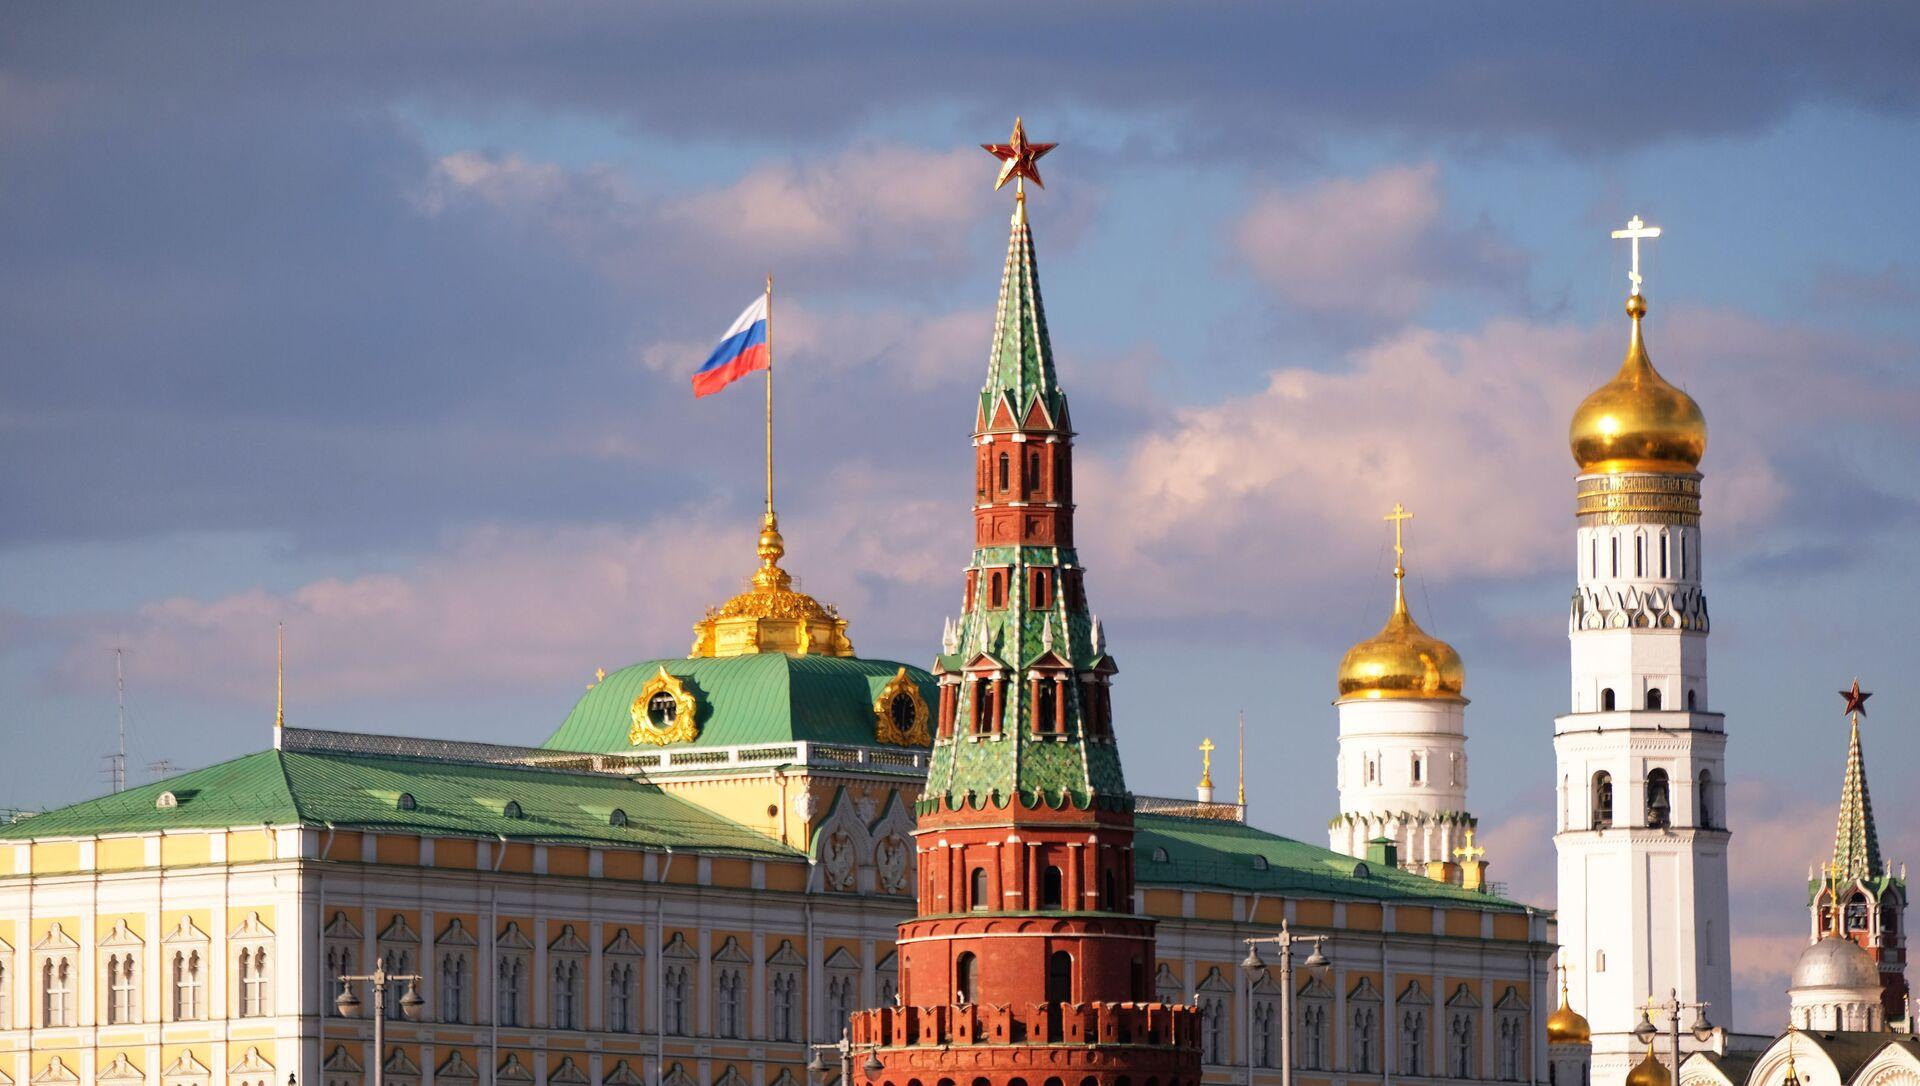 El Kremlin de Moscú - Sputnik Mundo, 1920, 17.06.2019